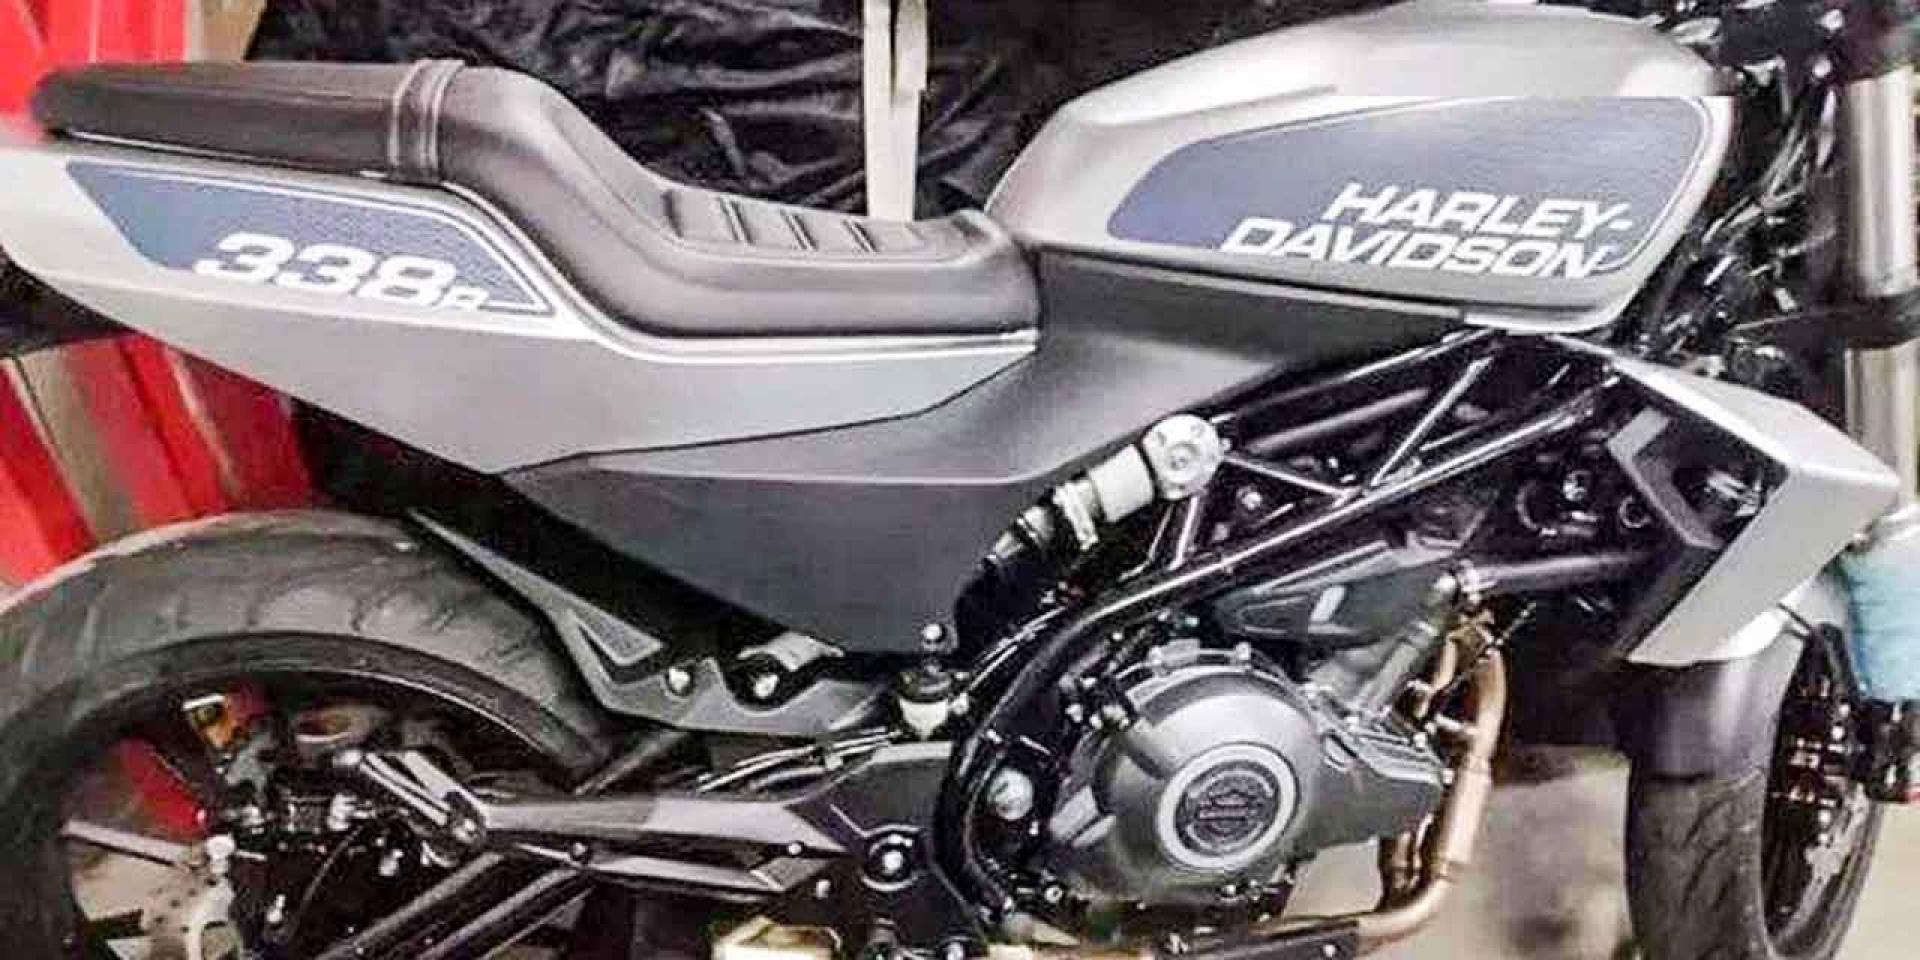 Harley-Davidson 338R實車曝光!小排量哈雷街車近期登場?